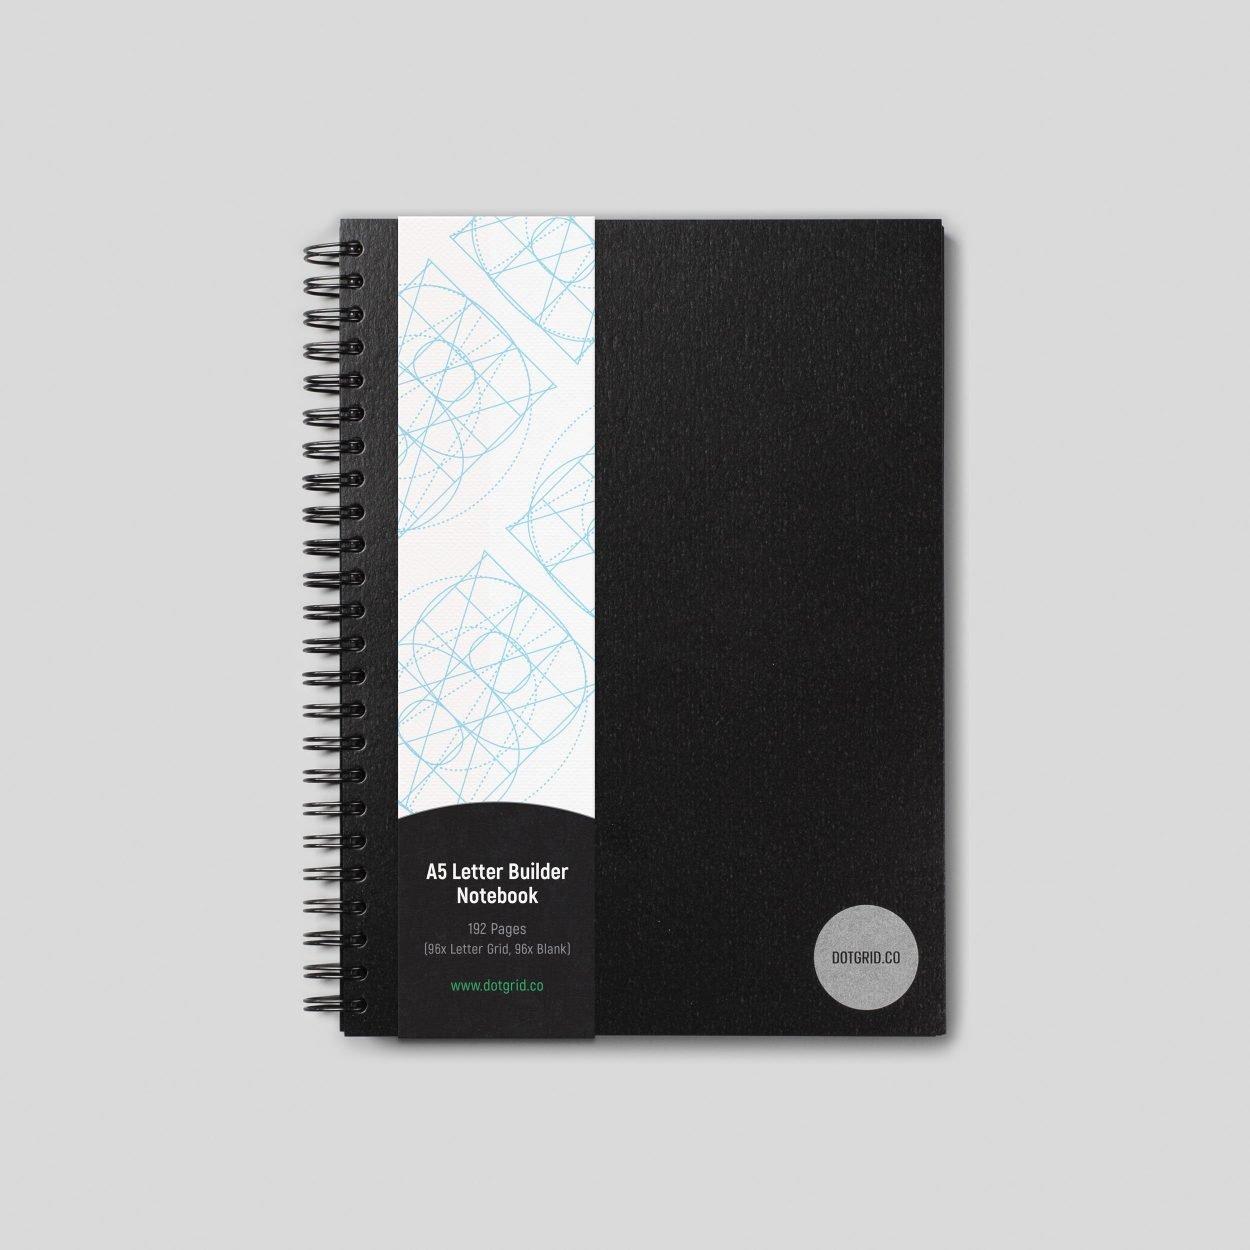 A5 Letter Builder Notebook